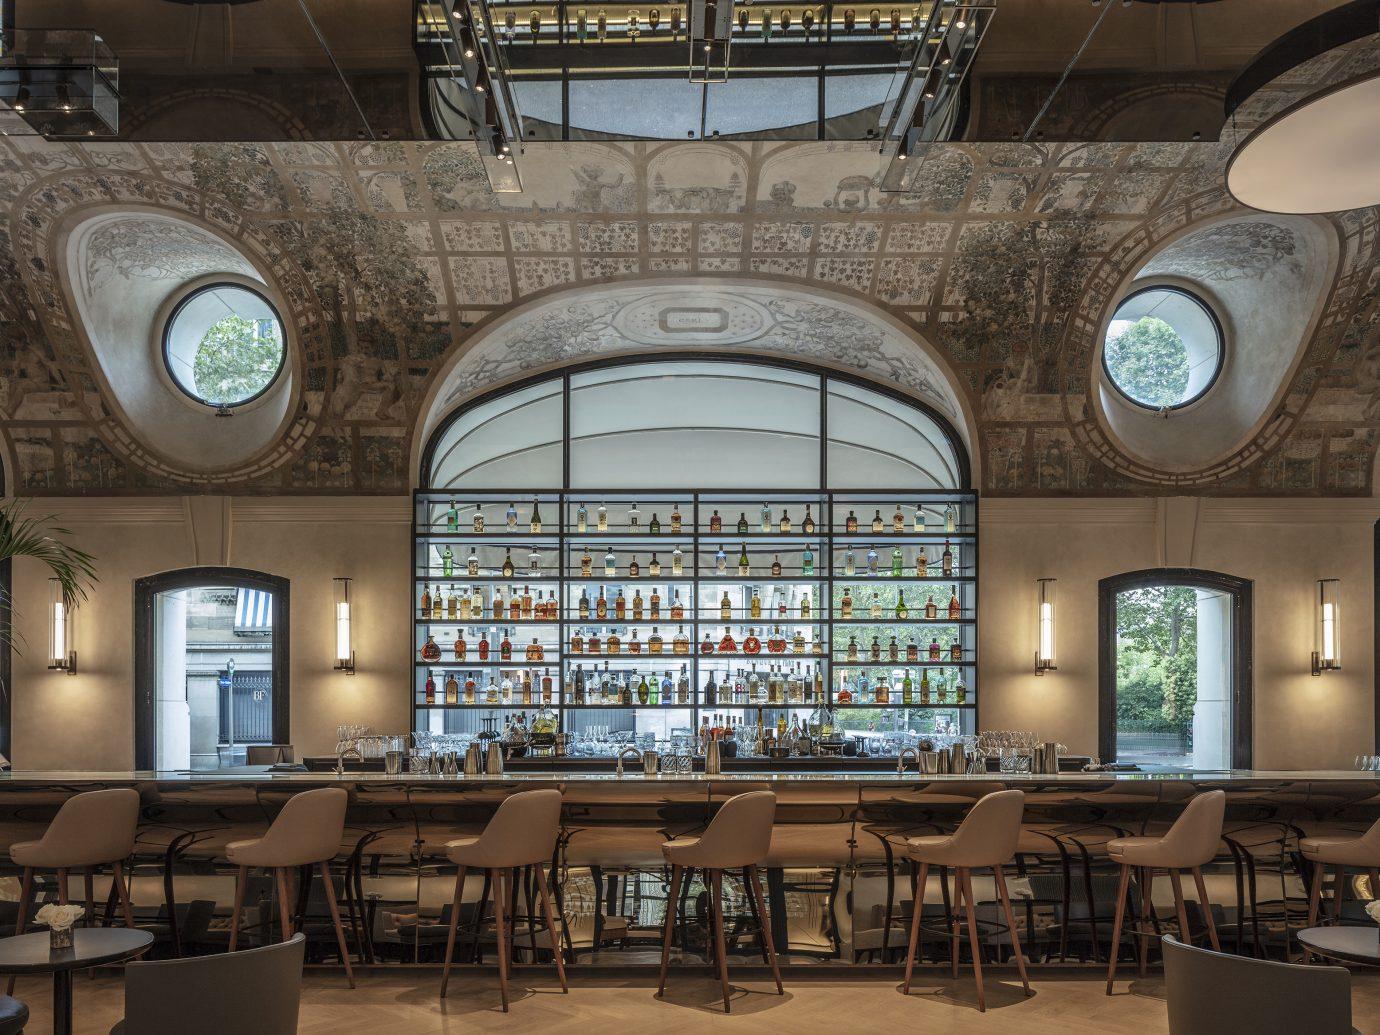 Bar Joséphine detail at Hotel Lutetia